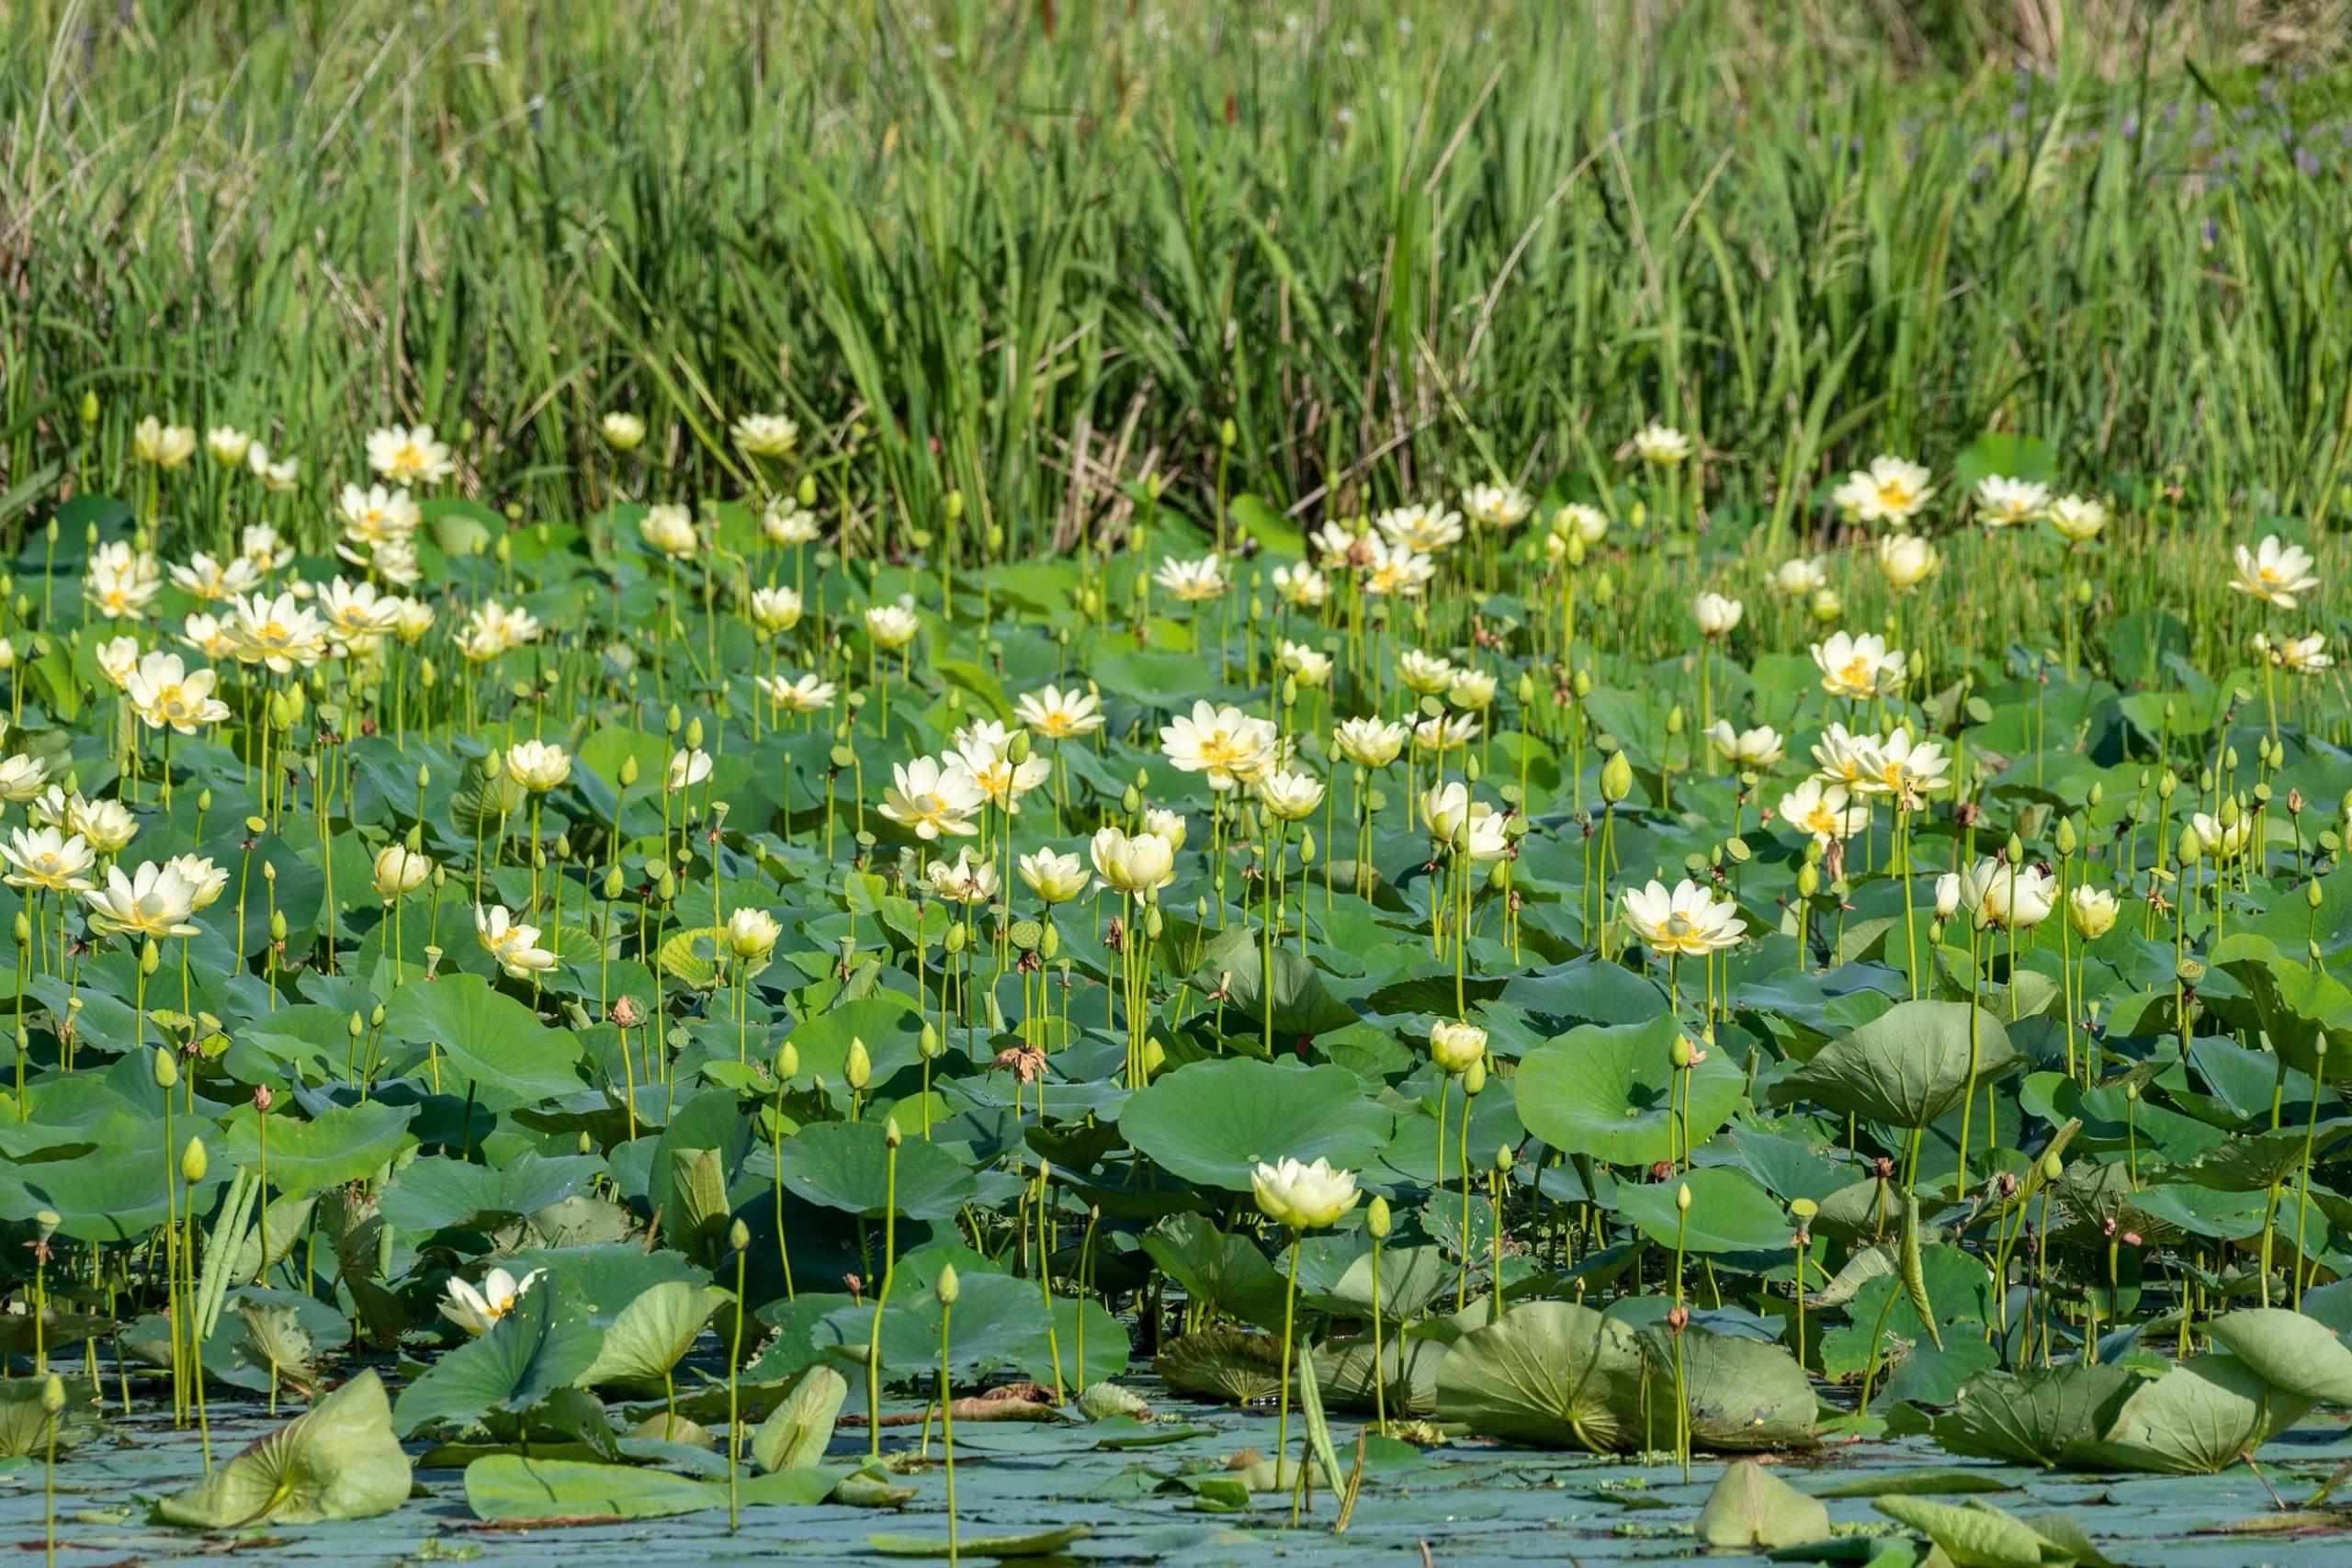 Field of water lilies